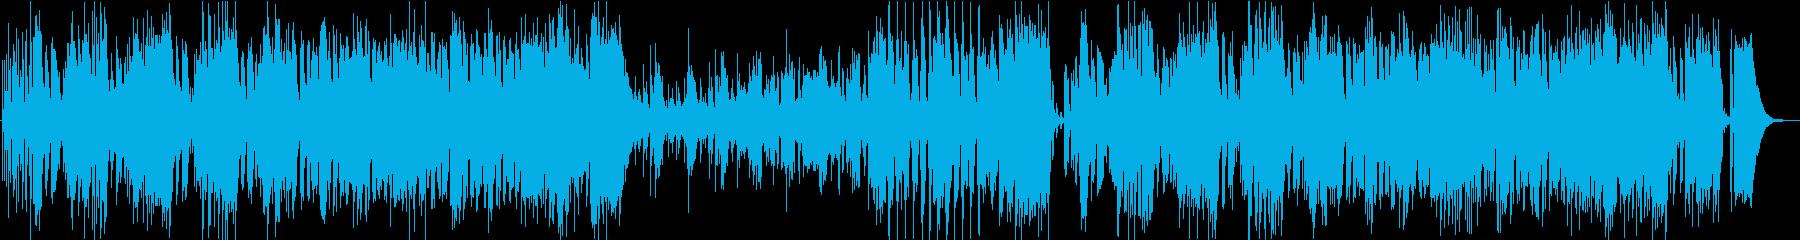 【CM】クール、ノリノリなJazzの再生済みの波形